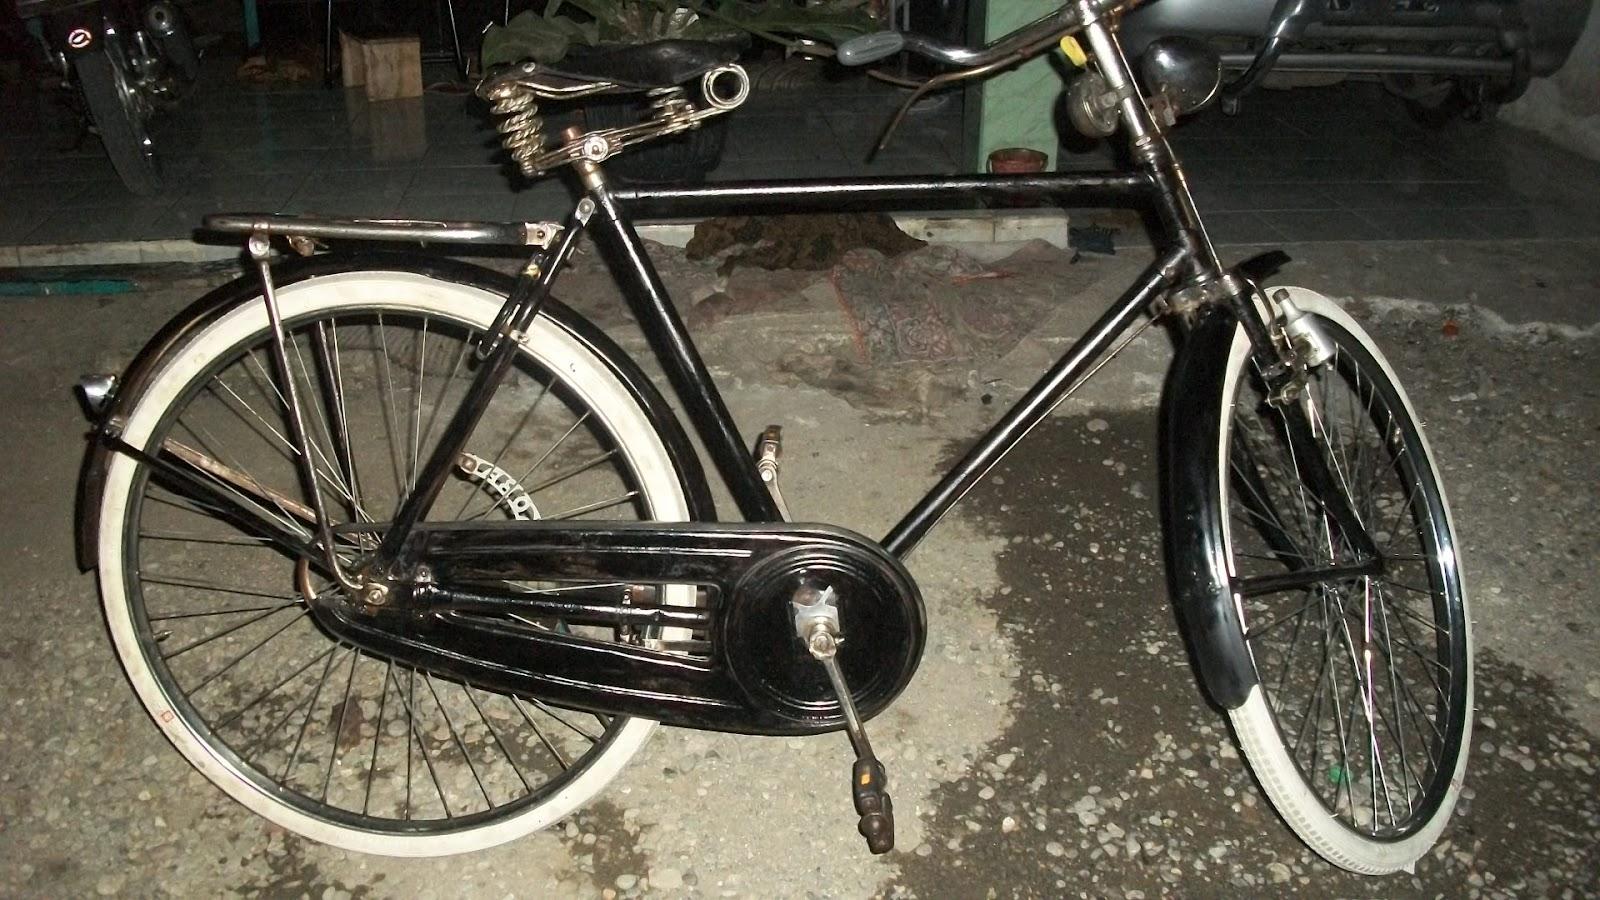 Koleksi Sepeda Onthel Kuno c ANTIK: BATAVUS HEREN seri 13